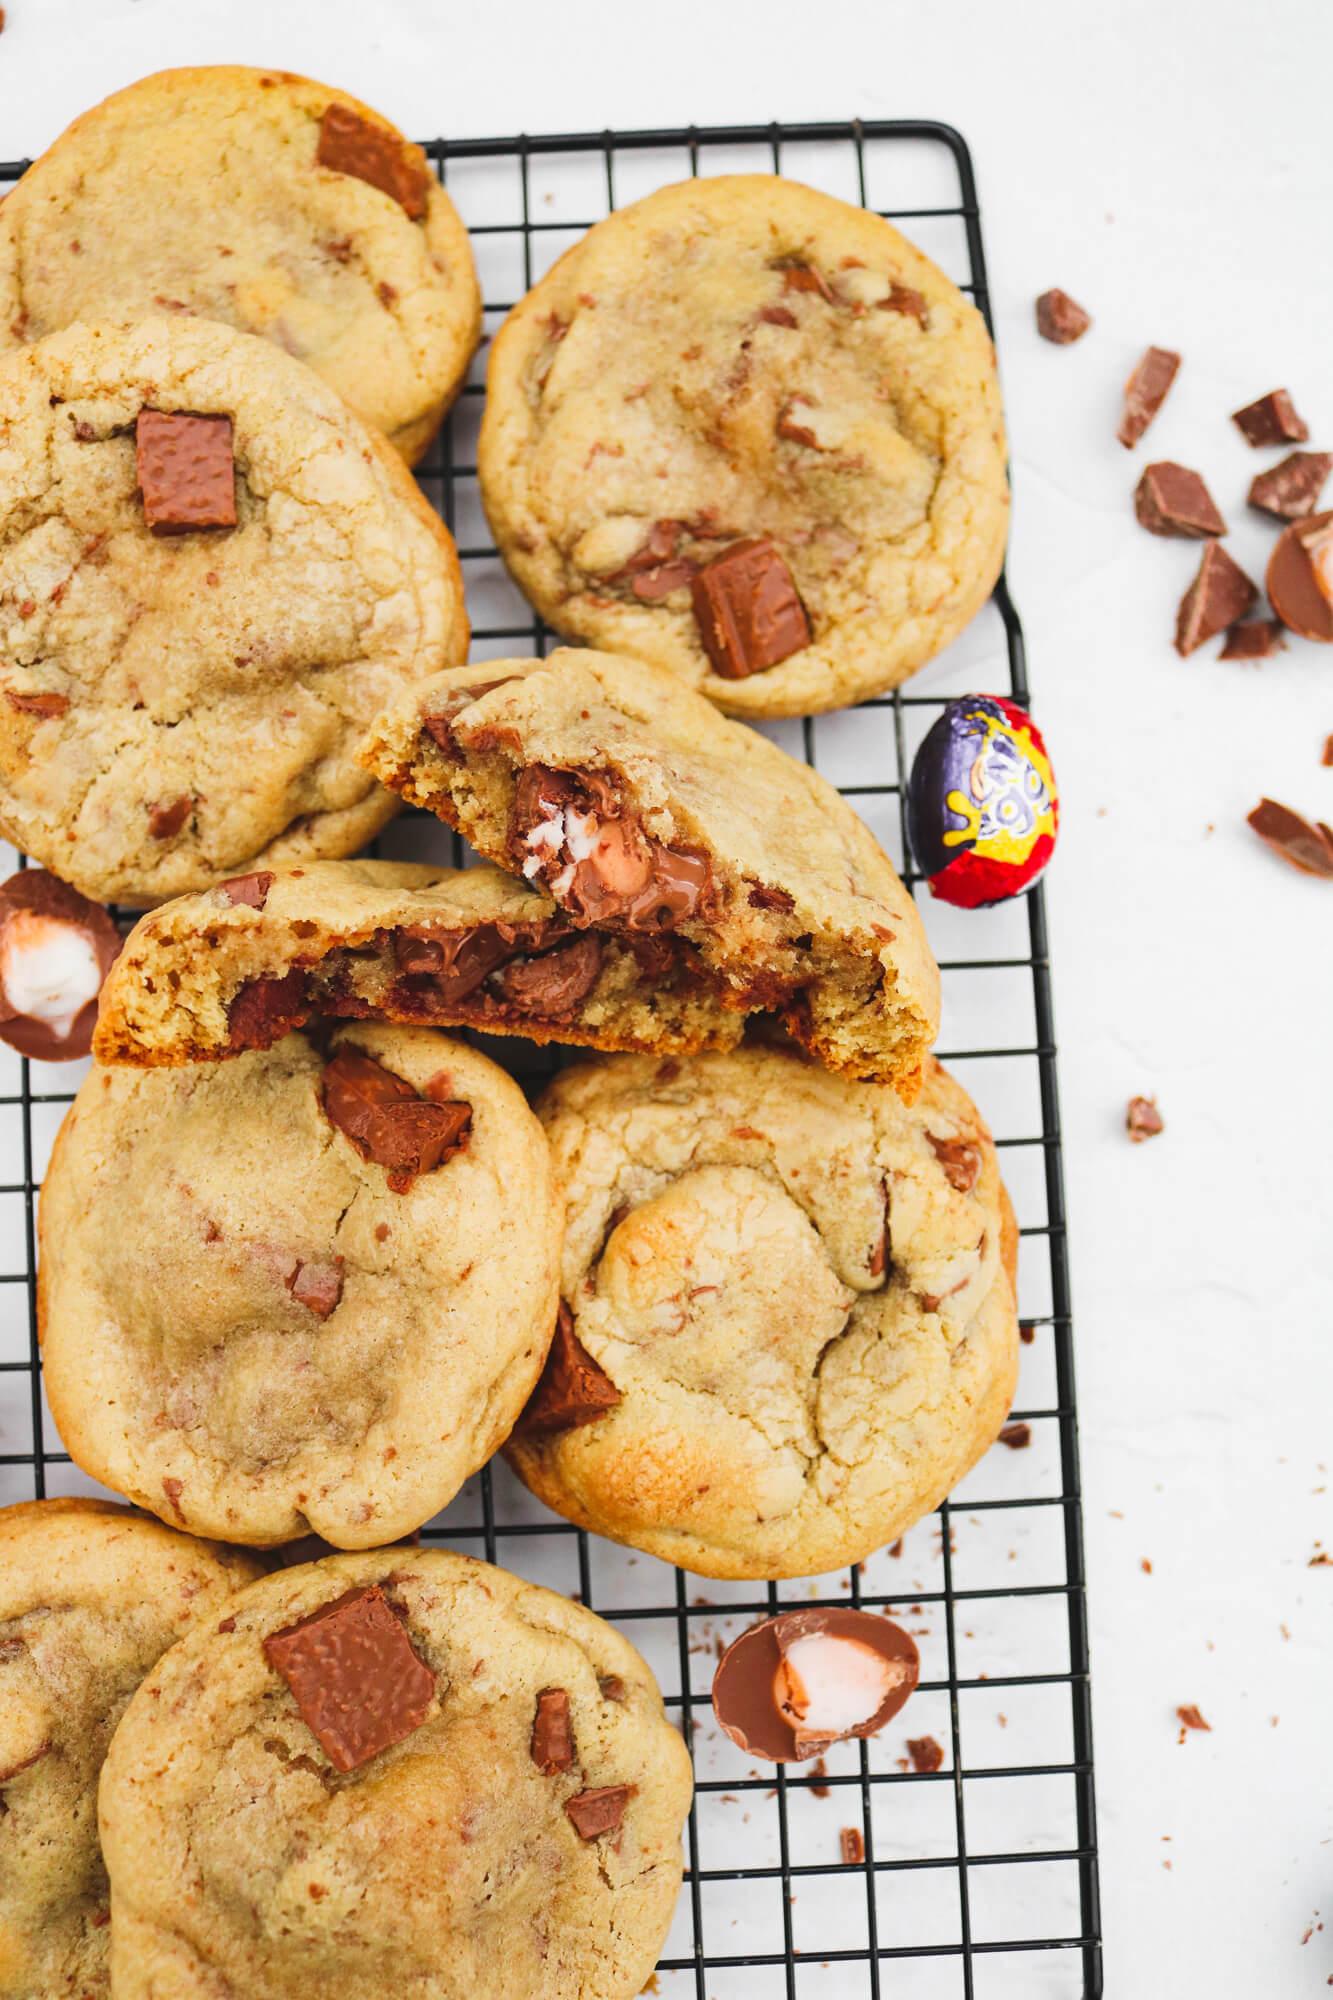 Creme Egg Chocolate Chunk Cookies | Take Some Whisks